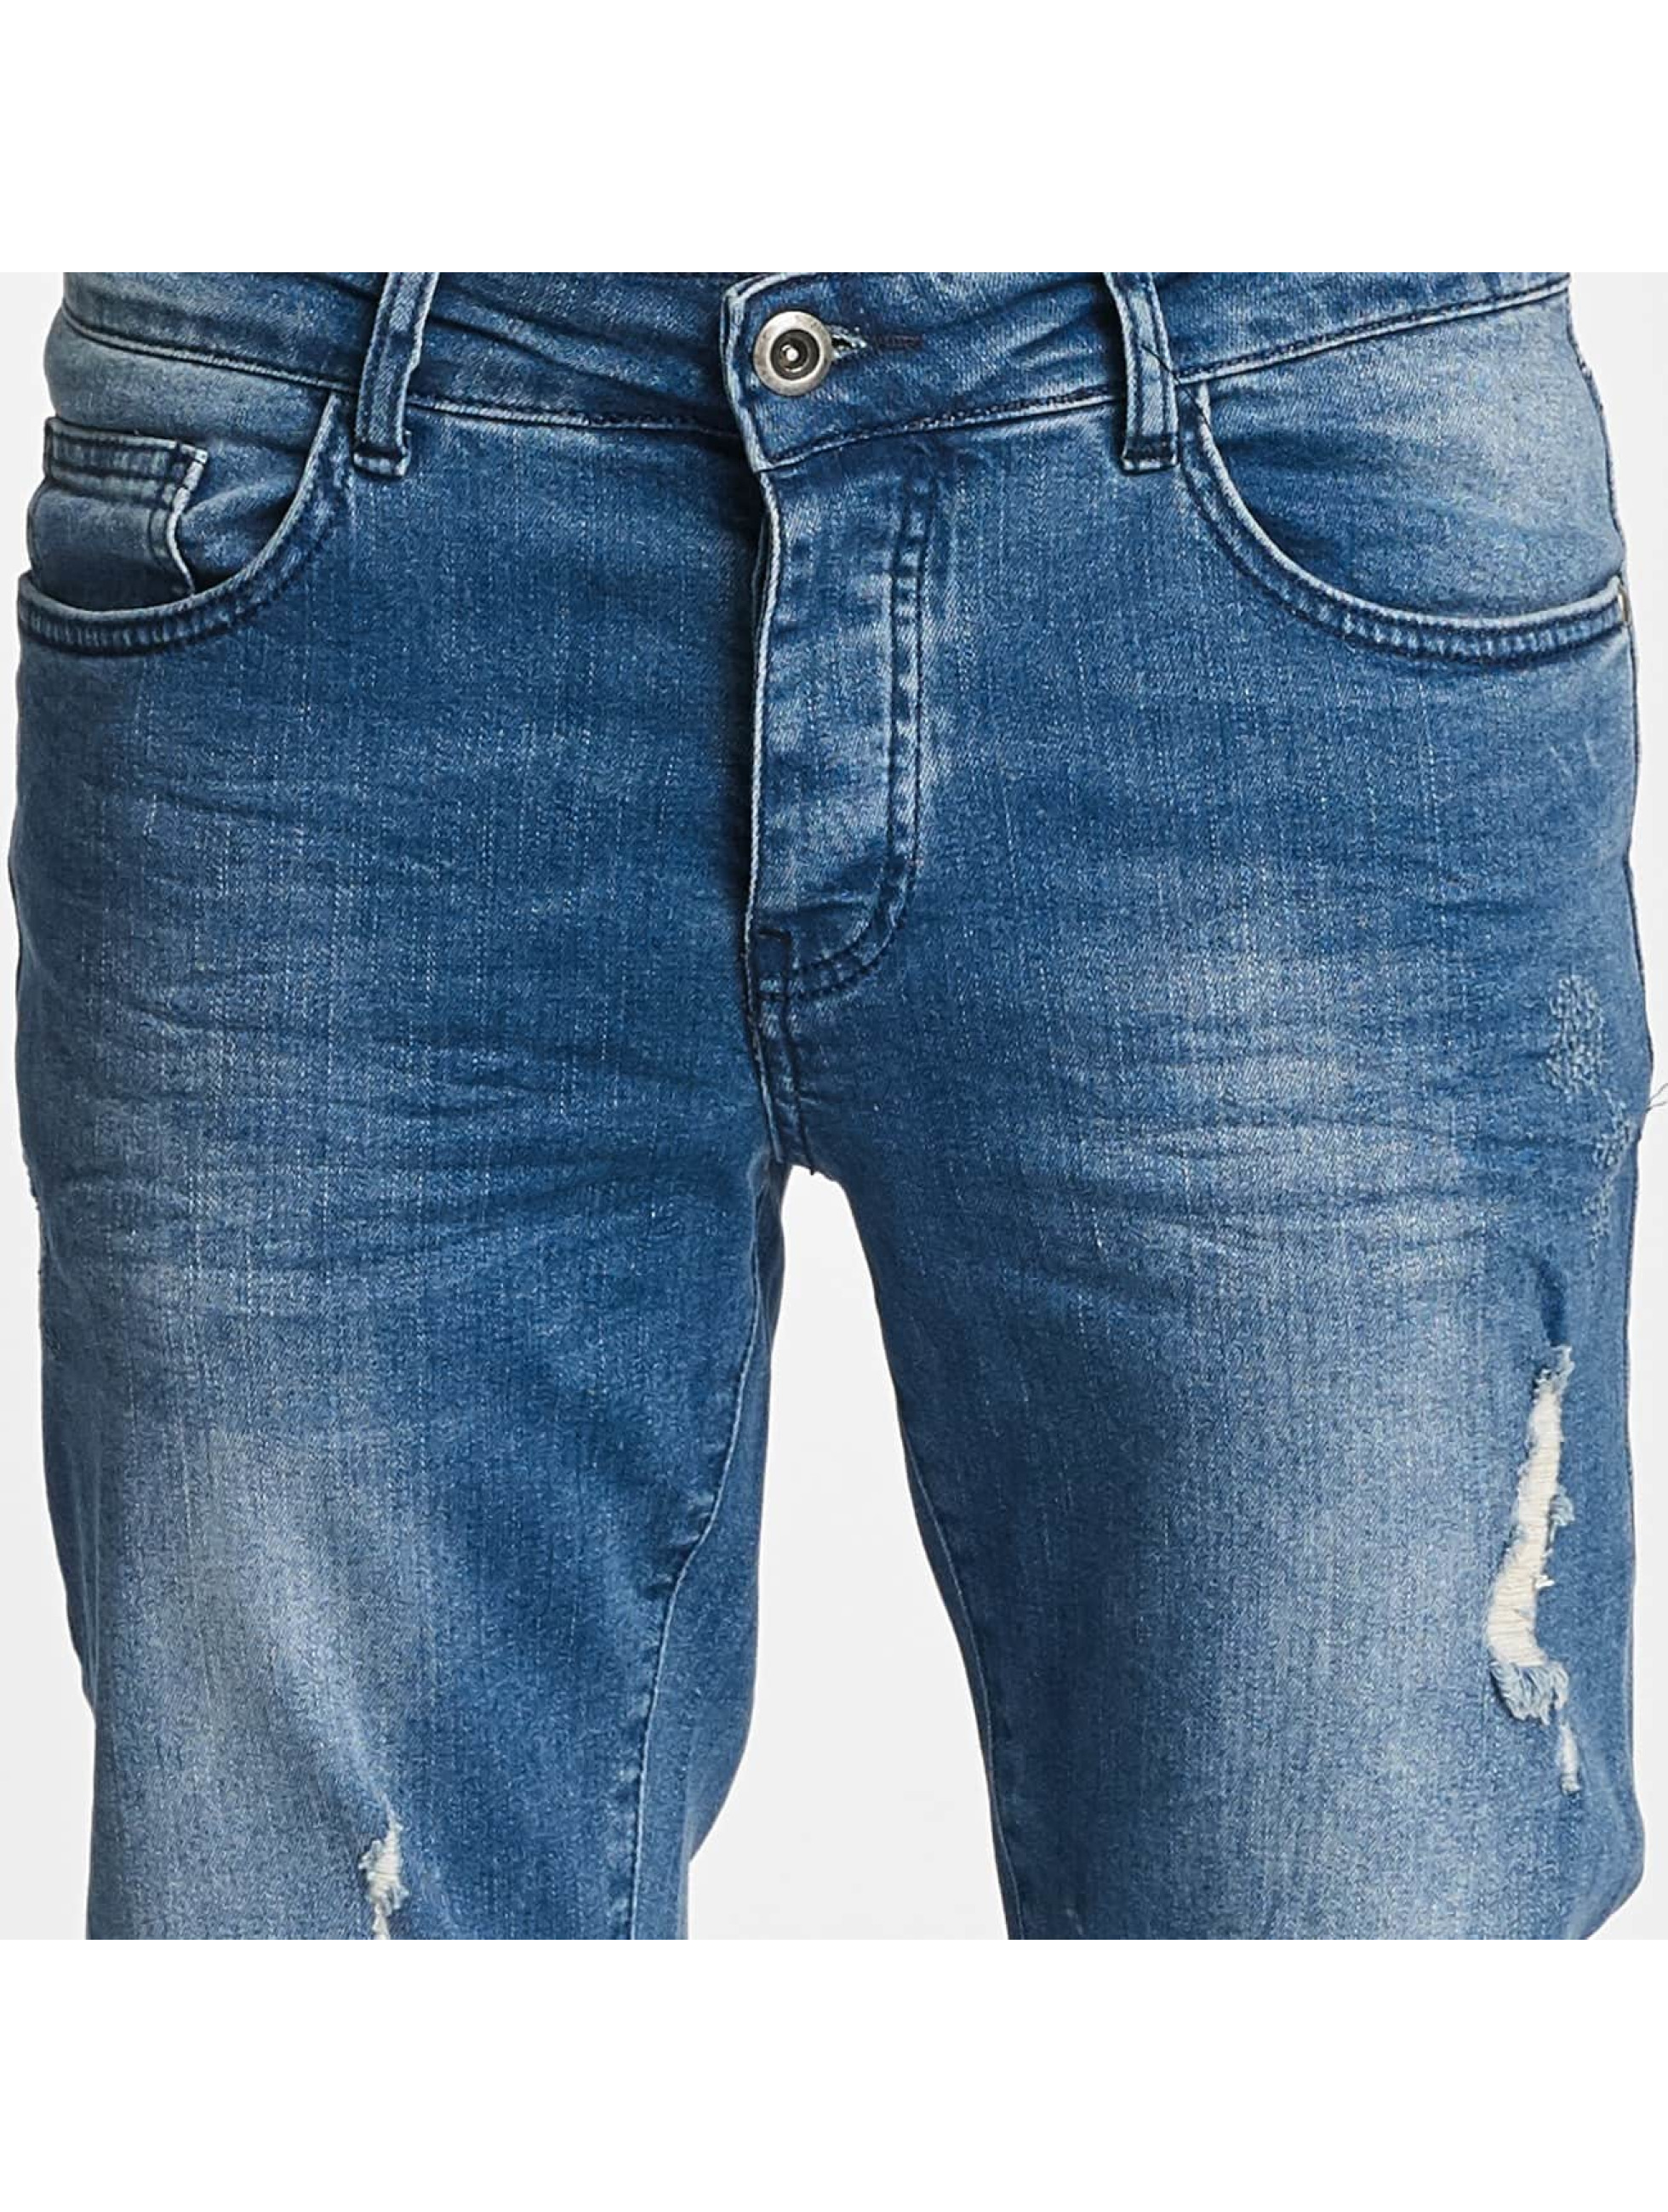 DEF Slim Fit Jeans John blue